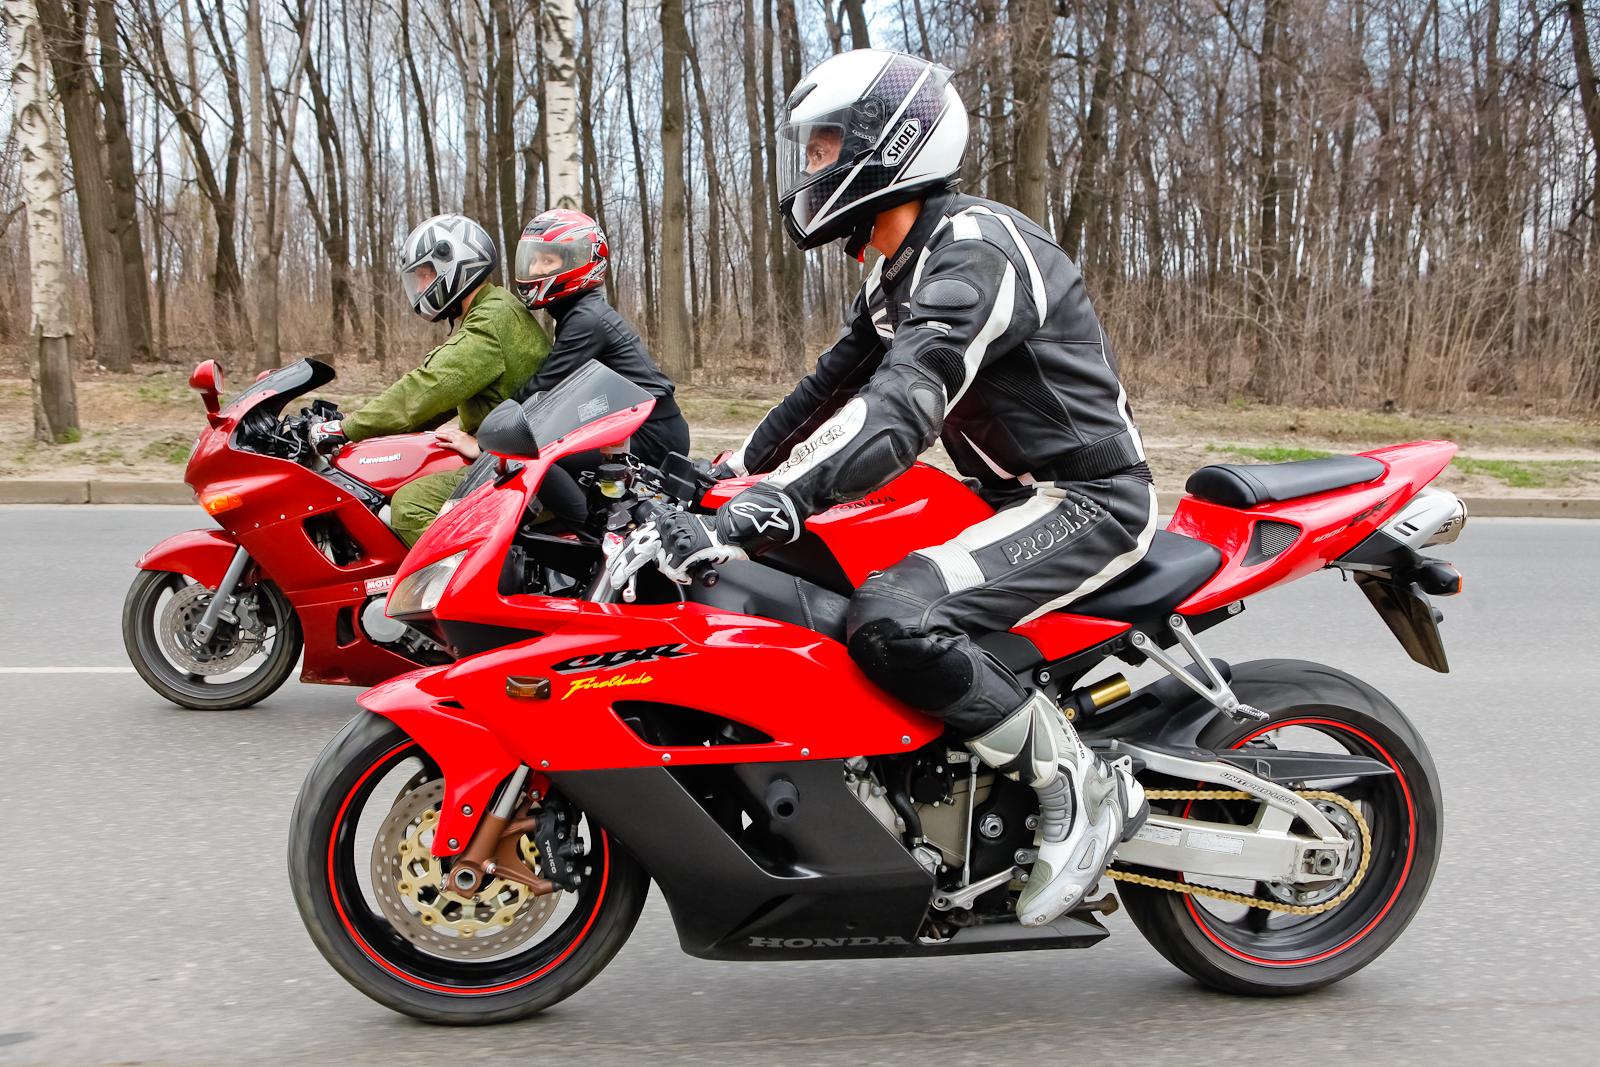 Biker, Adventure, Person, Travel, Transportation, HQ Photo